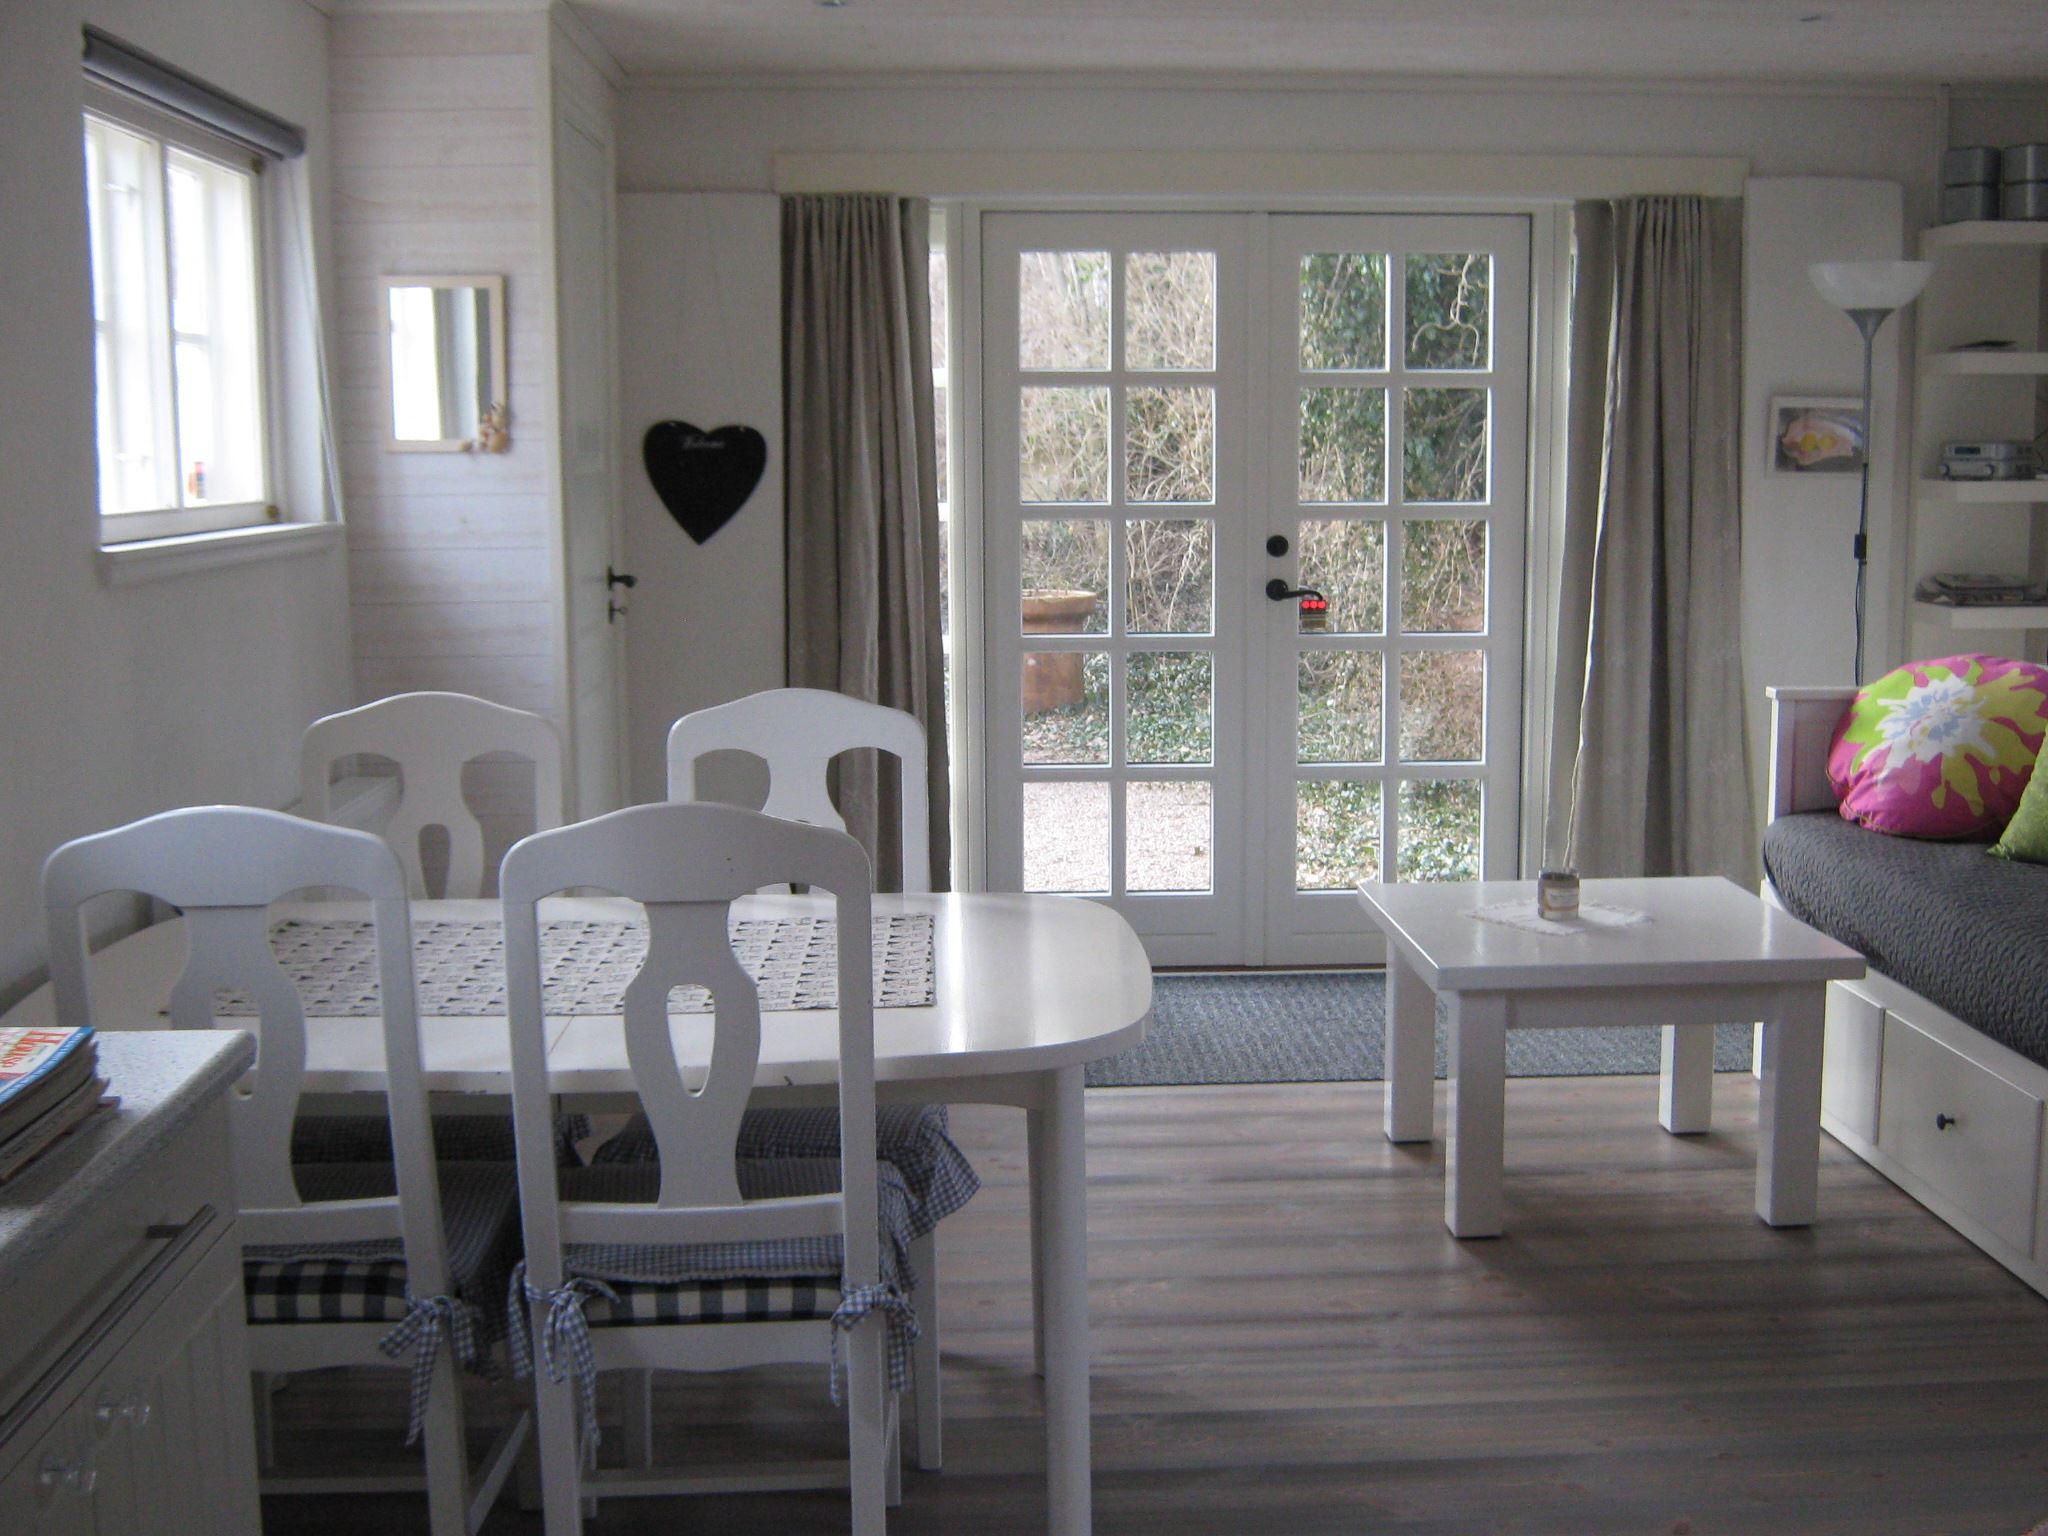 Hus i Jonstorp uthyres, Litet hus i Jonstorp